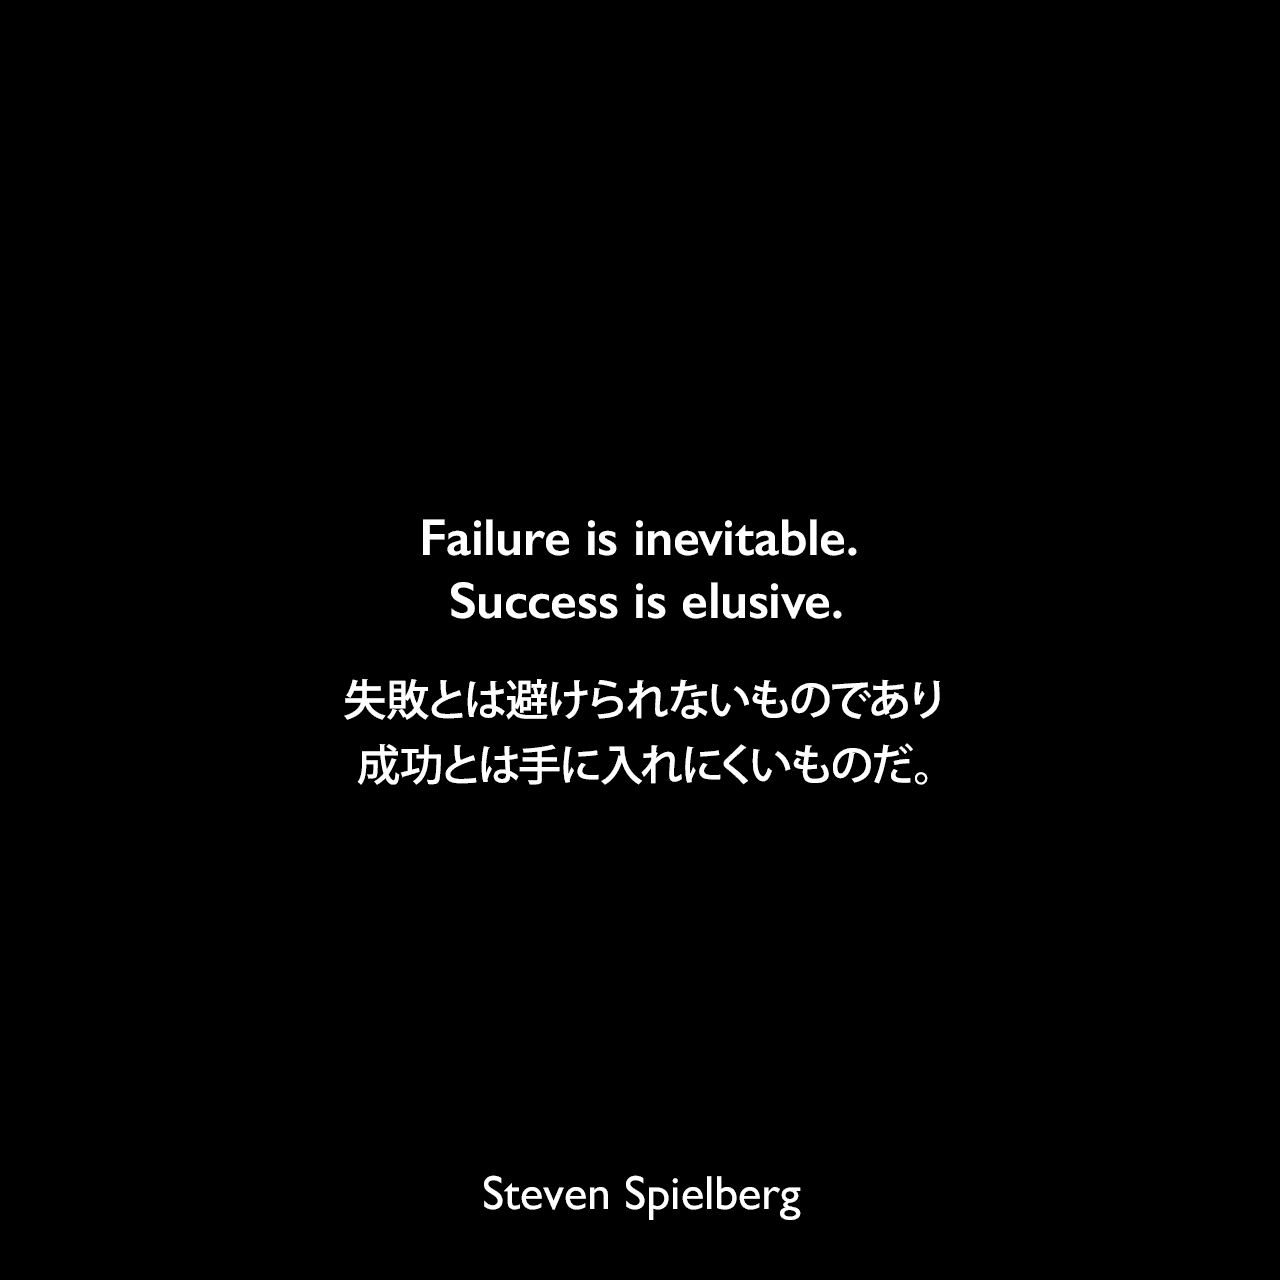 Failure is inevitable. Success is elusive.失敗とは避けられないものであり、成功とは手に入れにくいものだ。Steven Spielberg